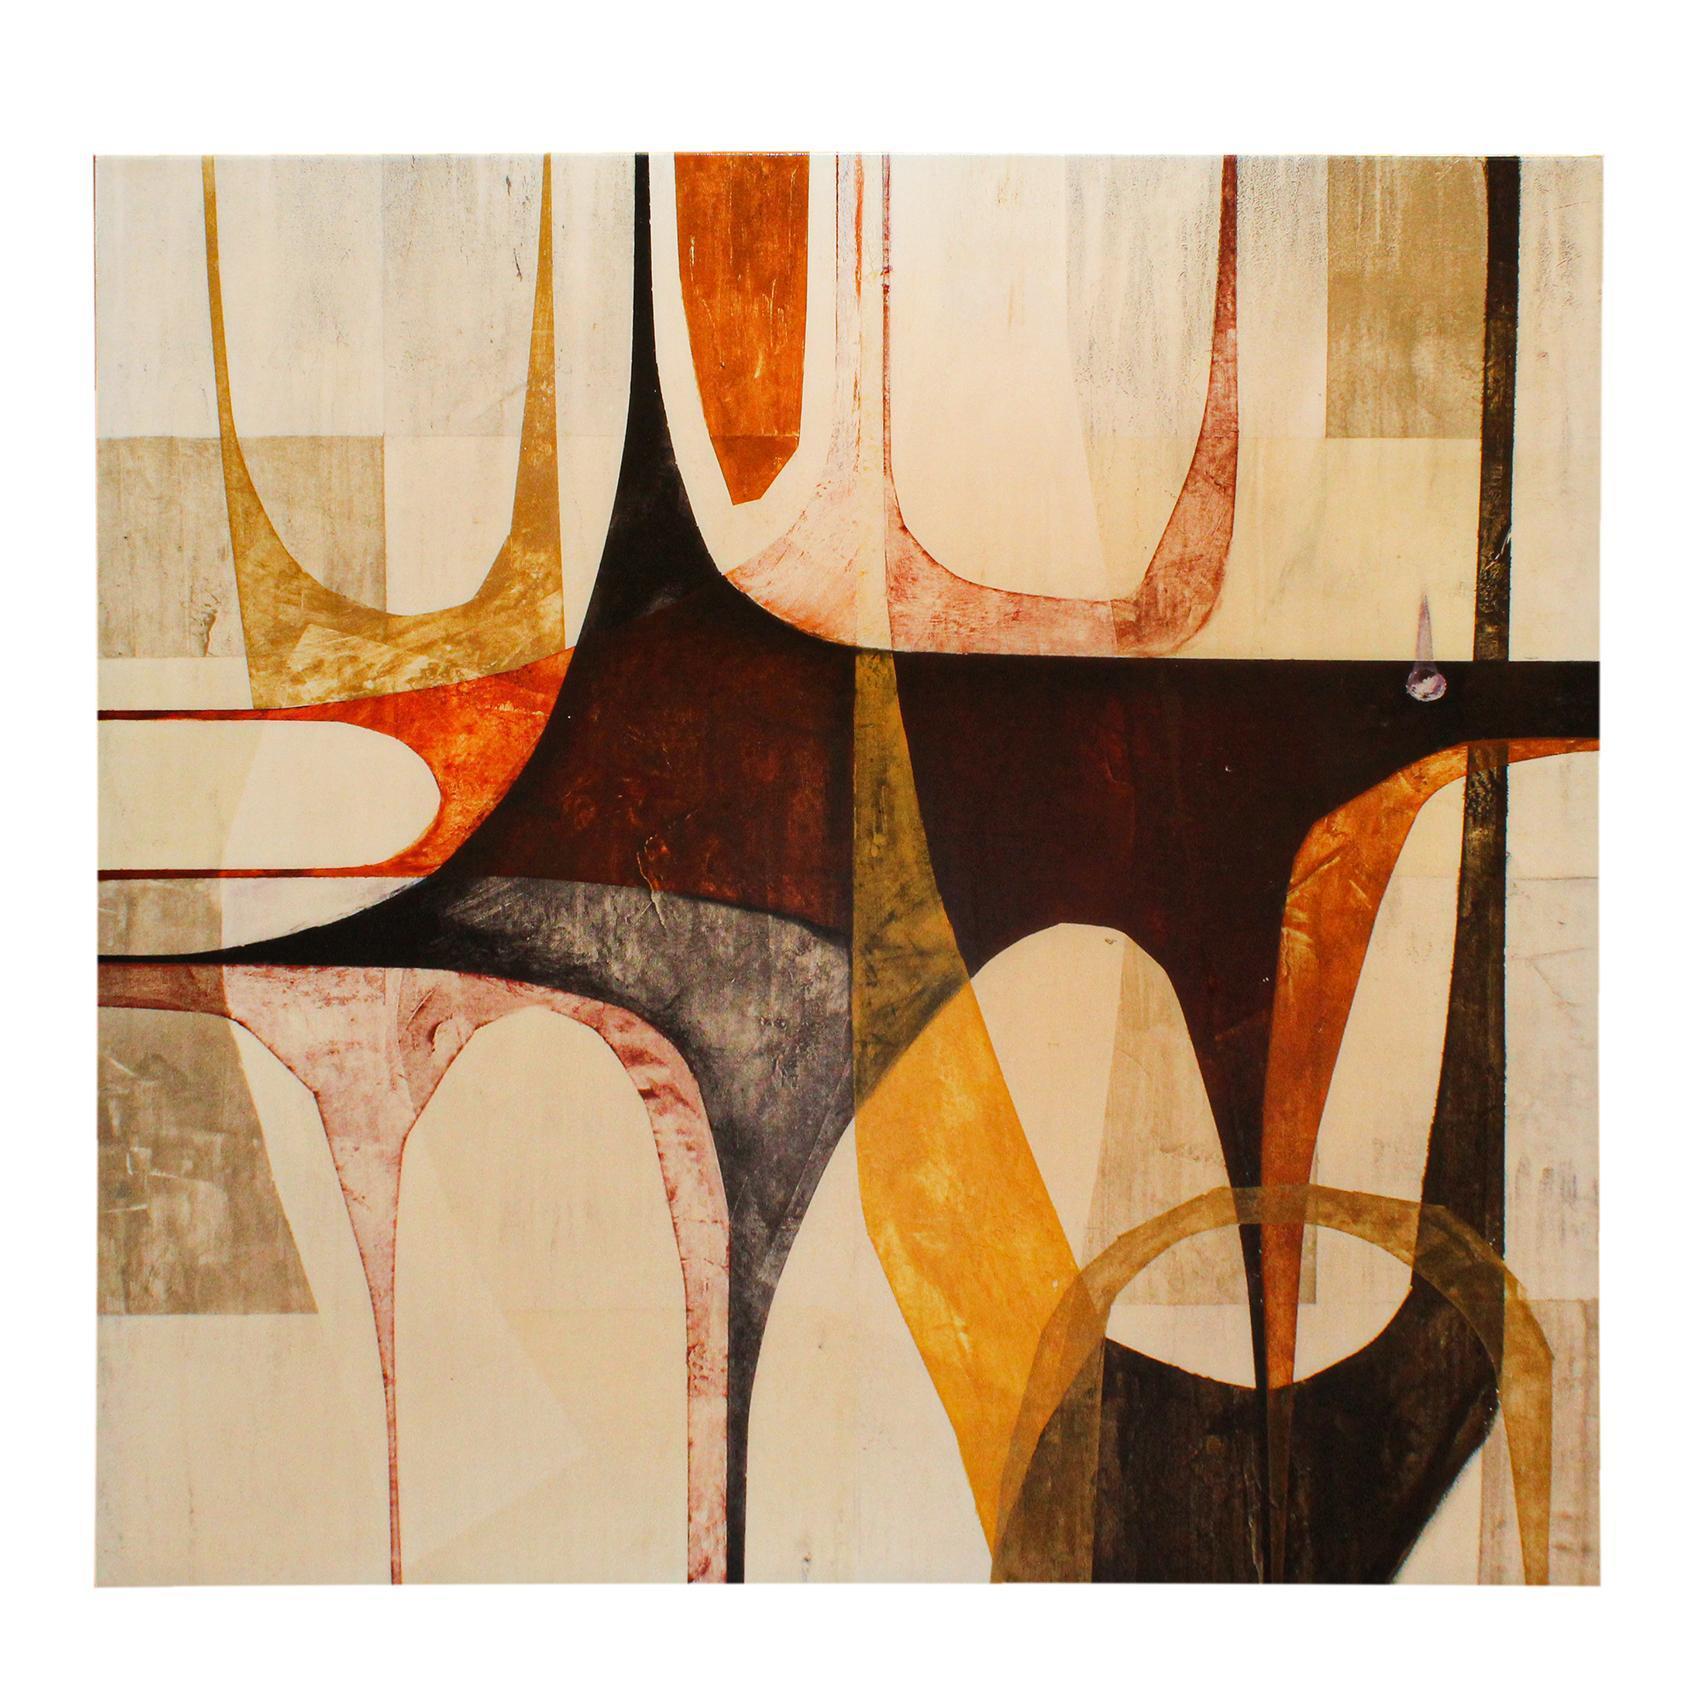 Shellacked Abstract Art